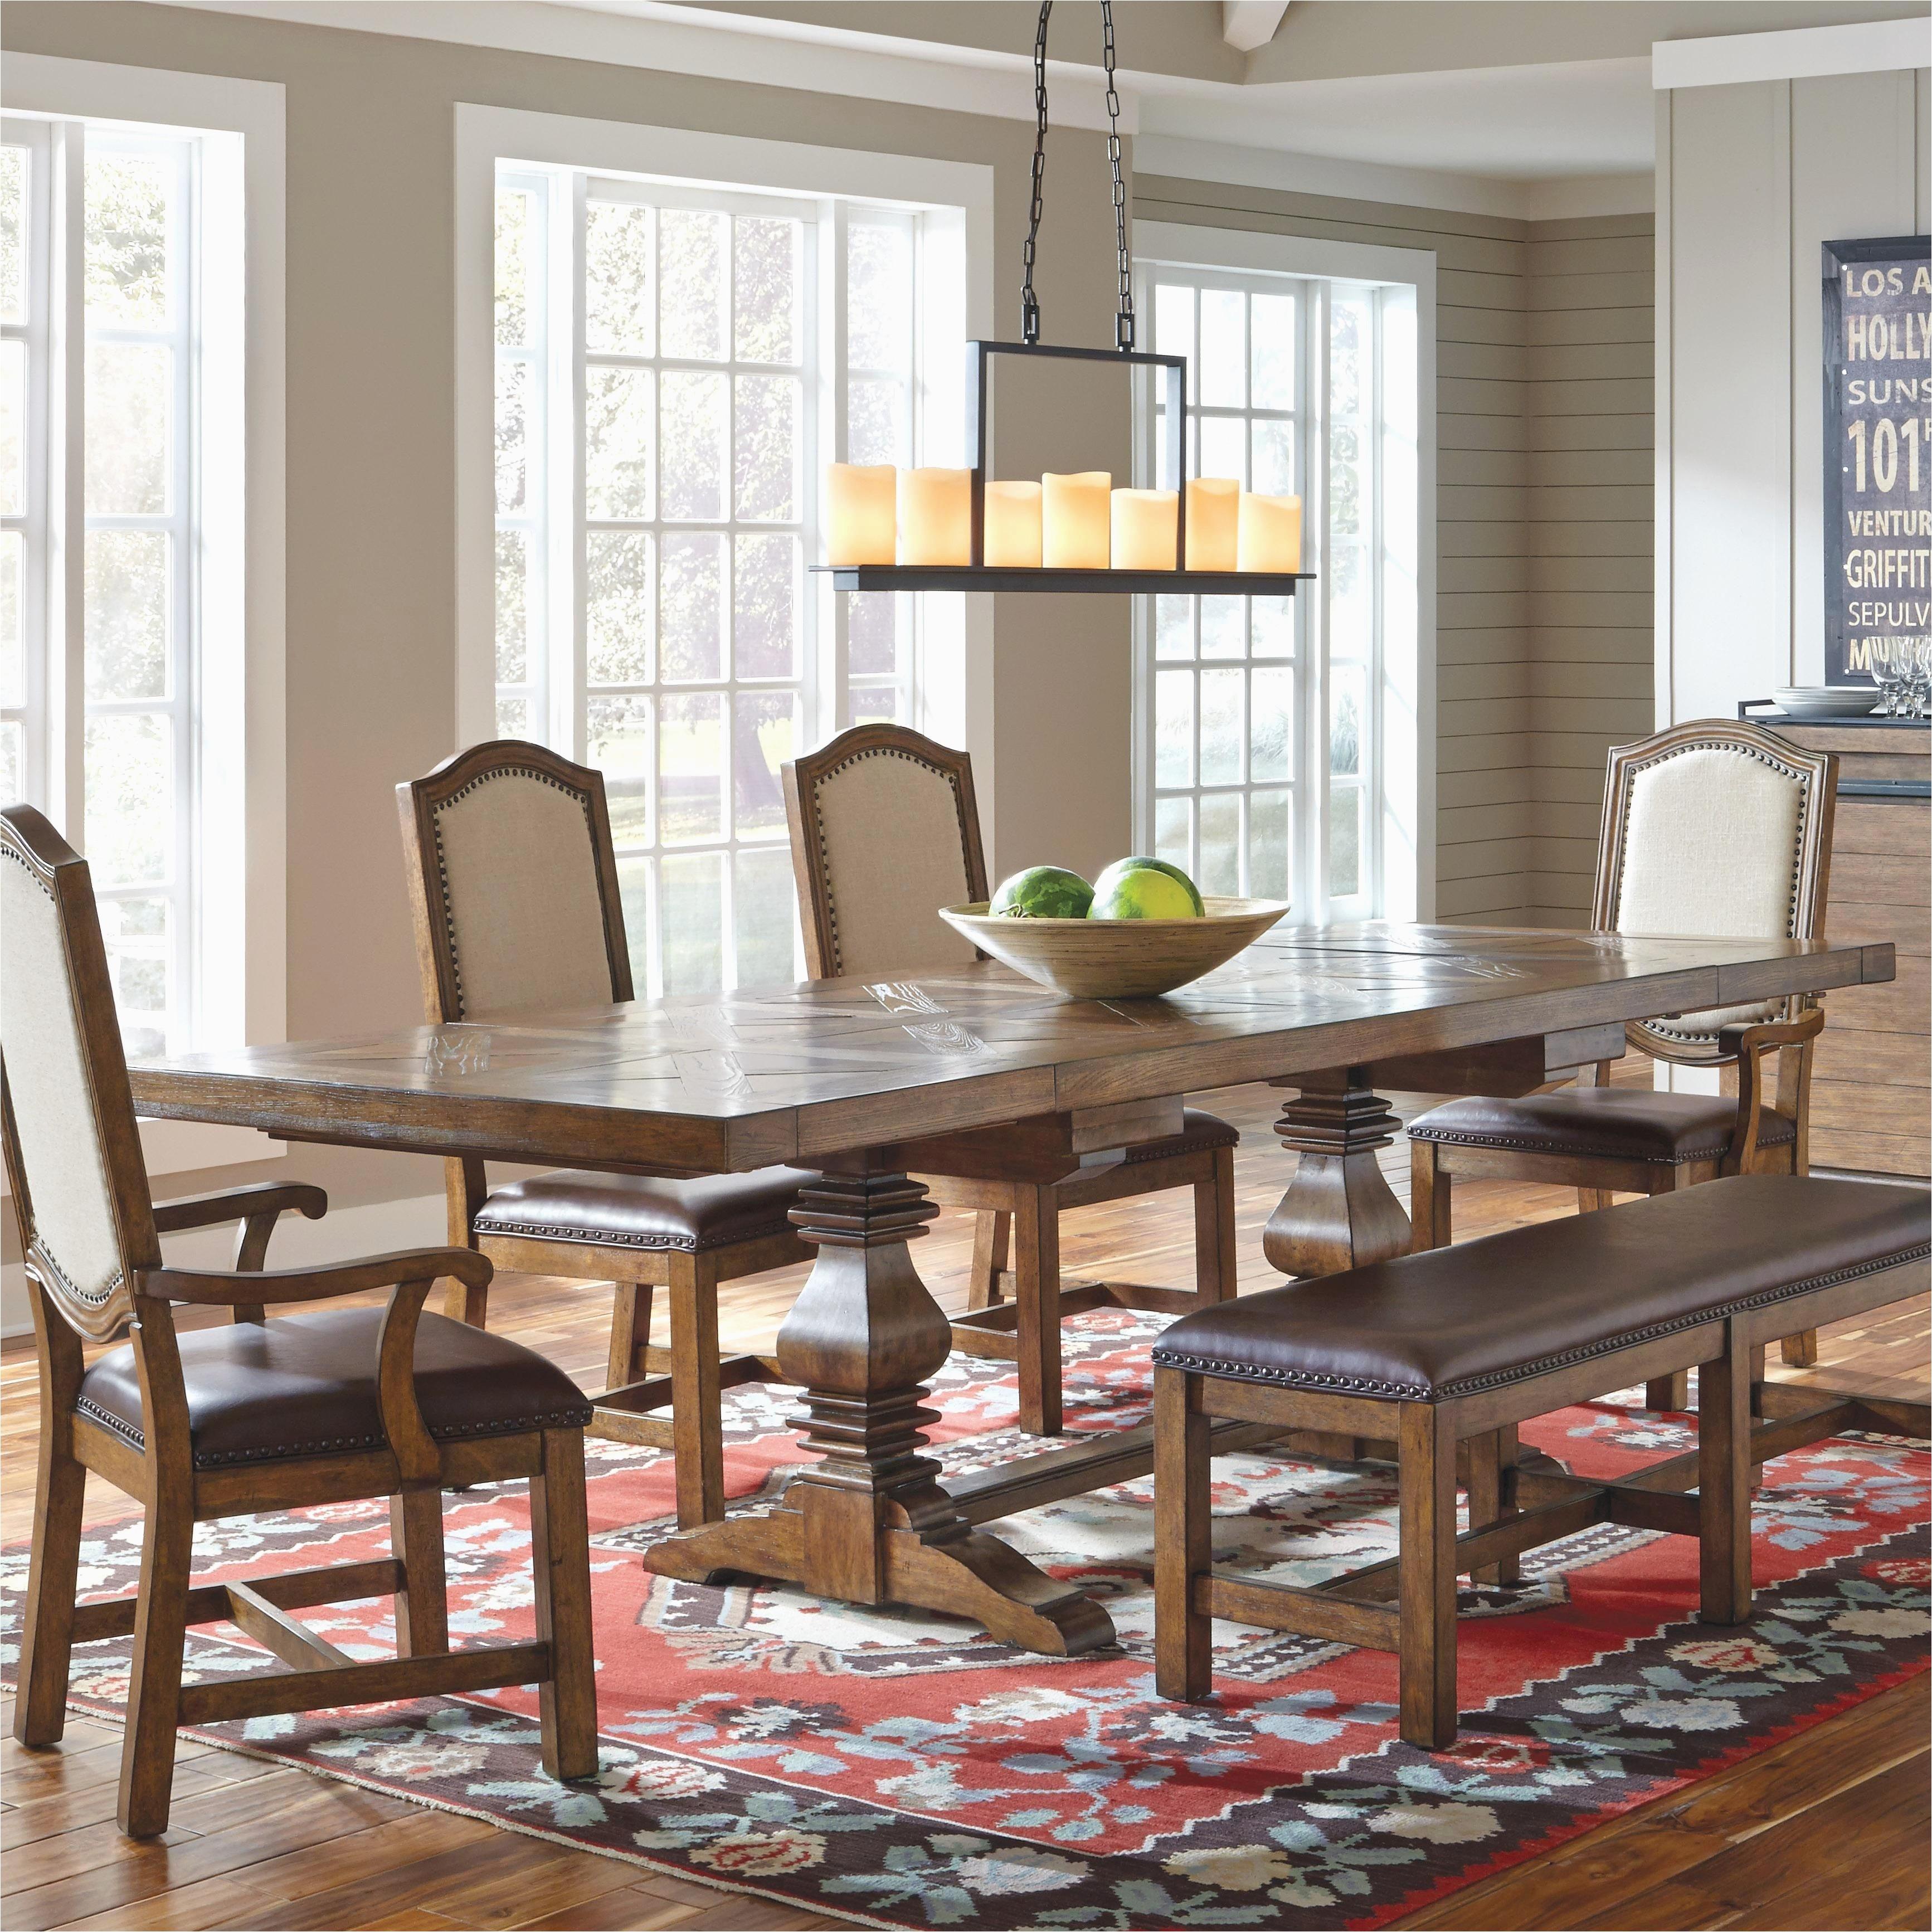 Jgw Furniture 35 American Furniture Warehouse Living Room Chairs Norwin Home  Design